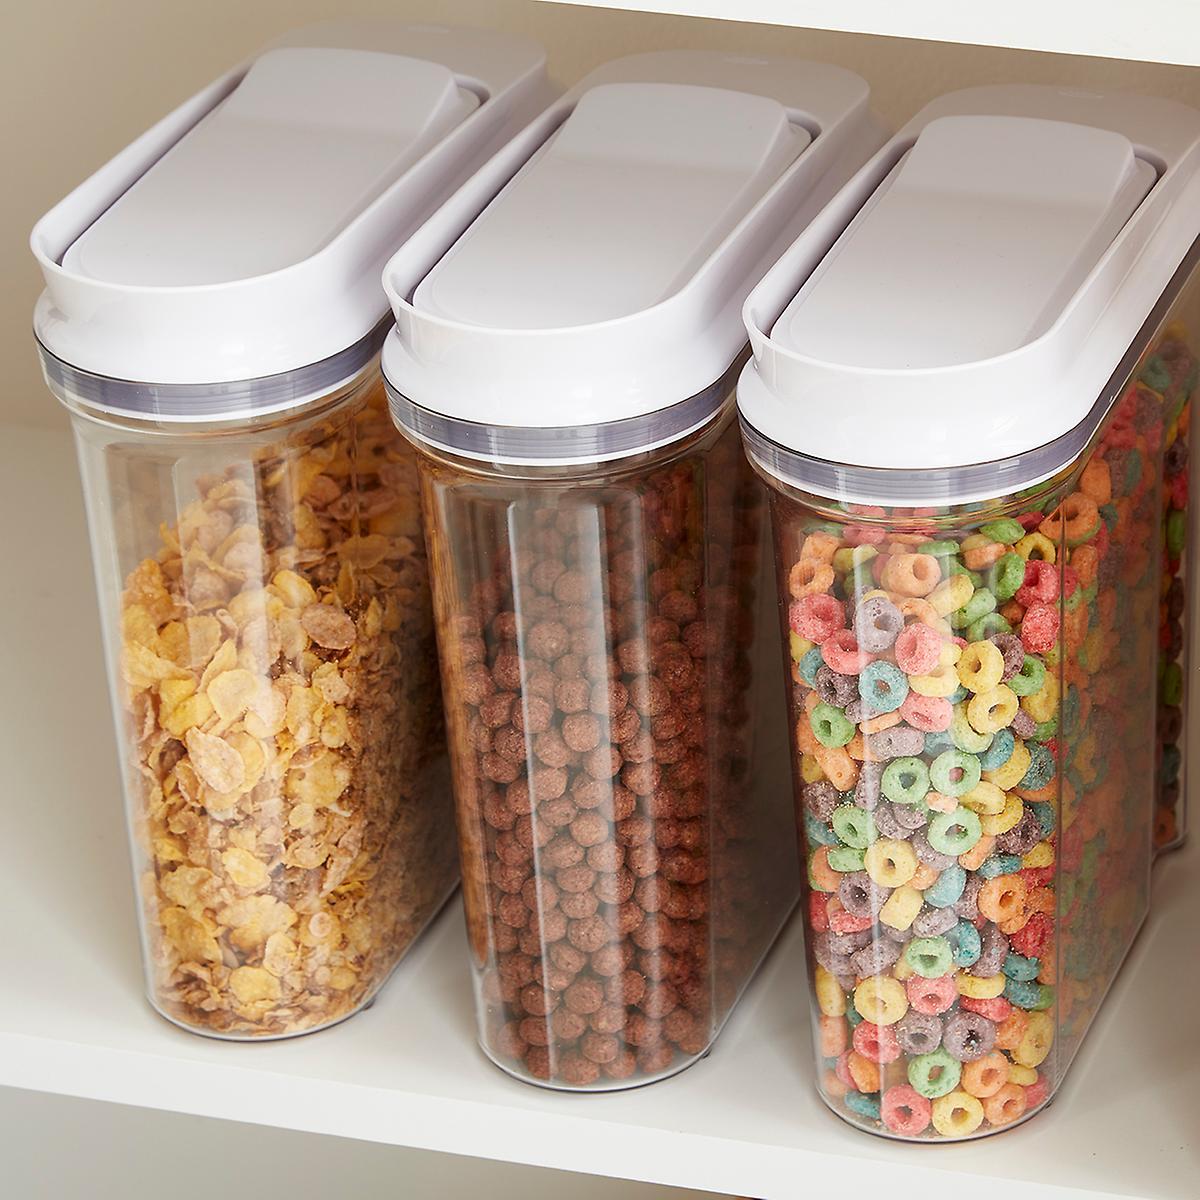 OXO Good Grips 3.4 qt. POP Cereal Dispenser